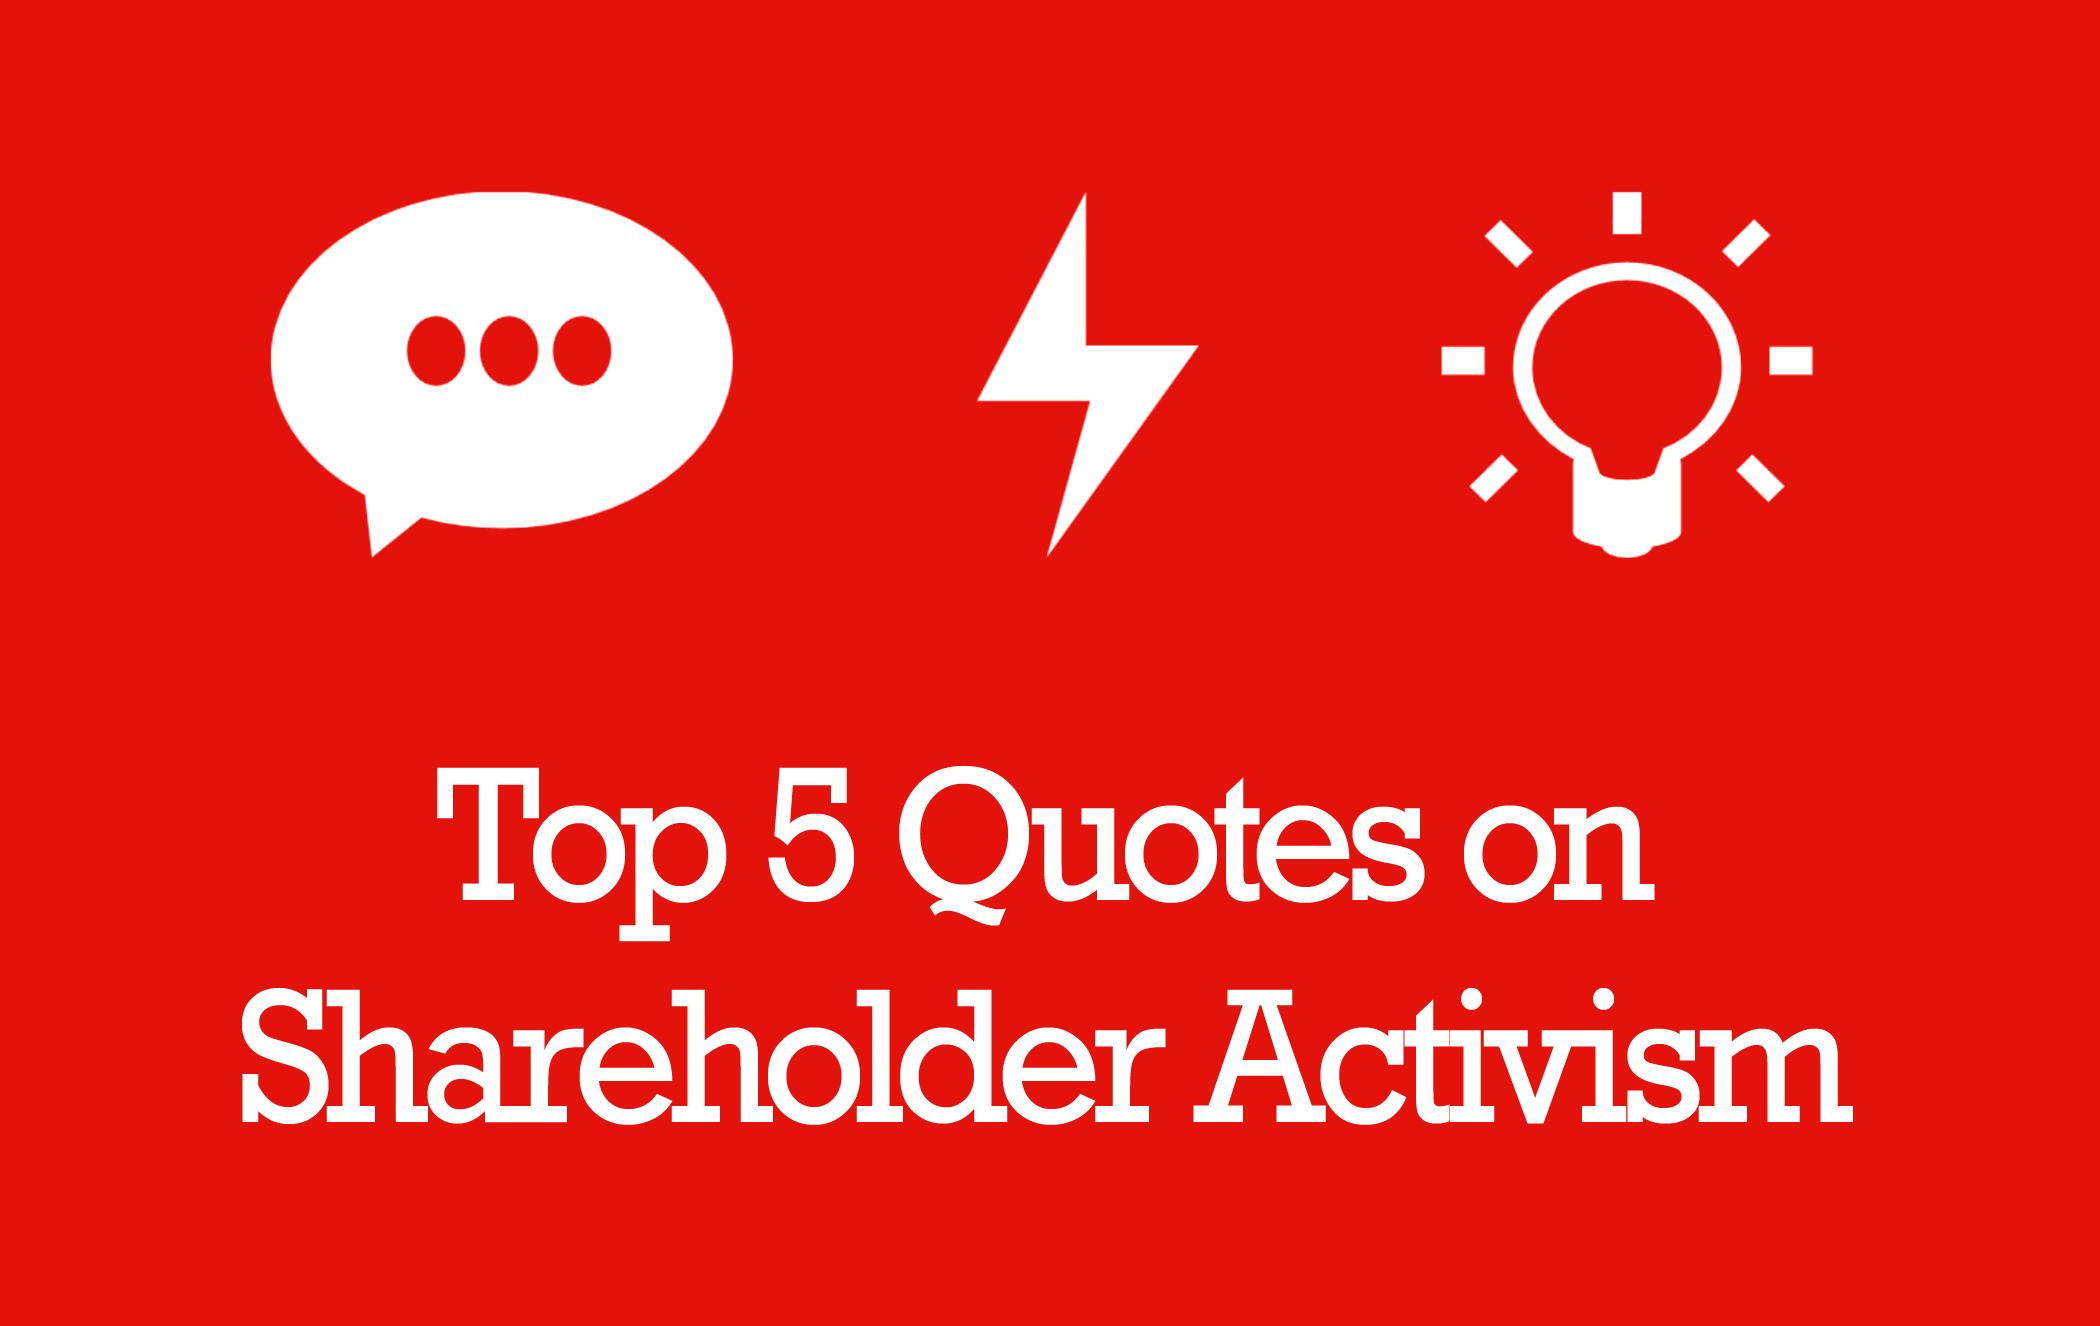 shareholders activism